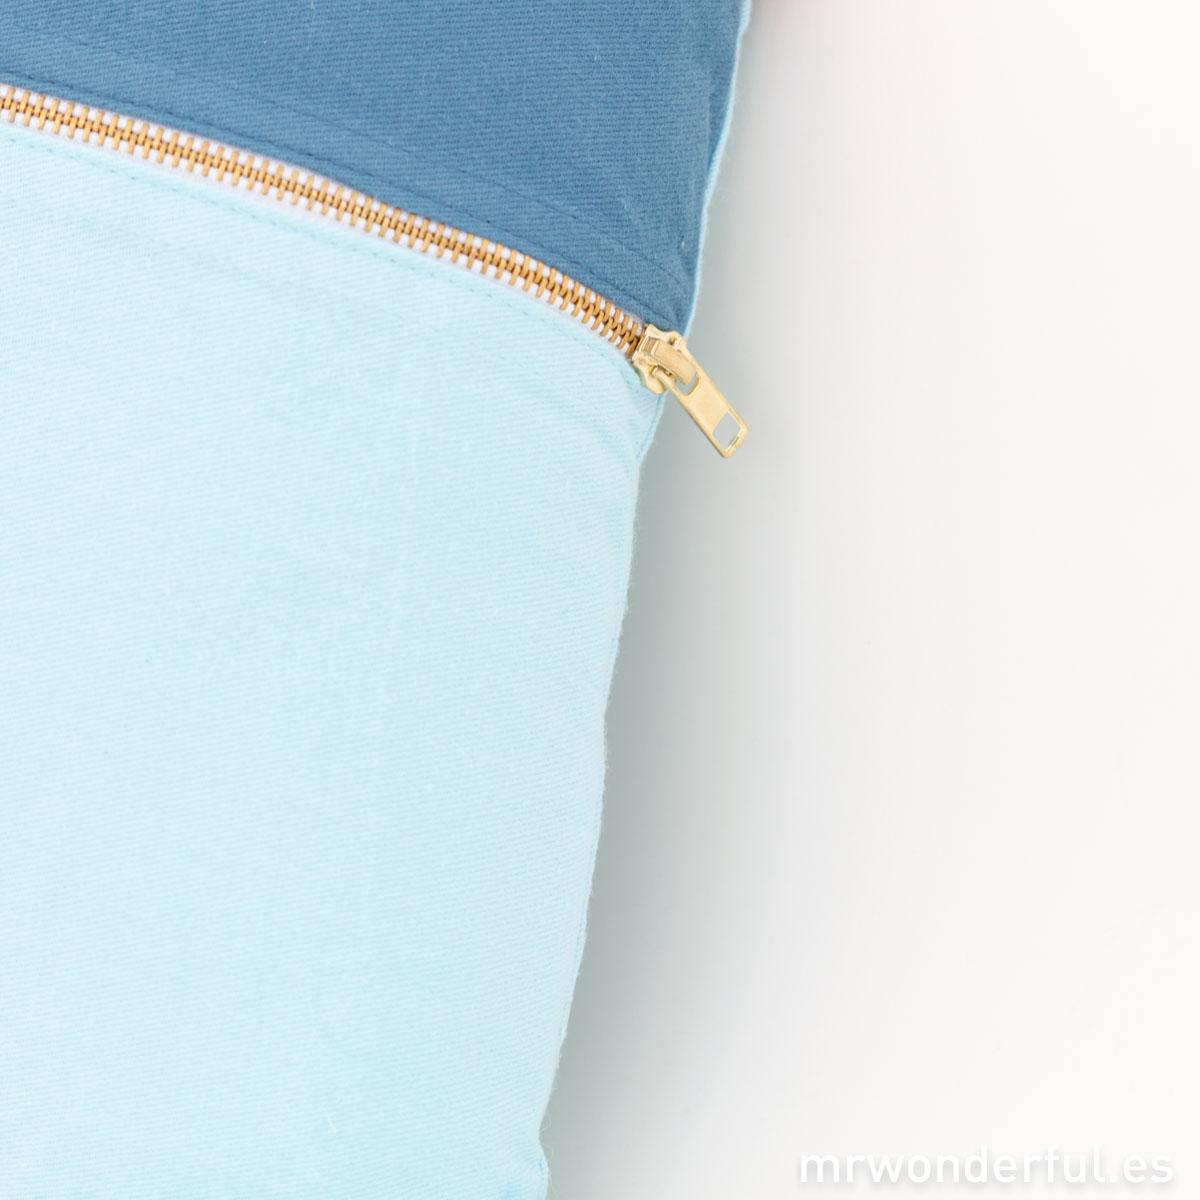 mrwonderful_PRA02881_Cojin-duo-rectangular-azul-y-mint-3-Editar